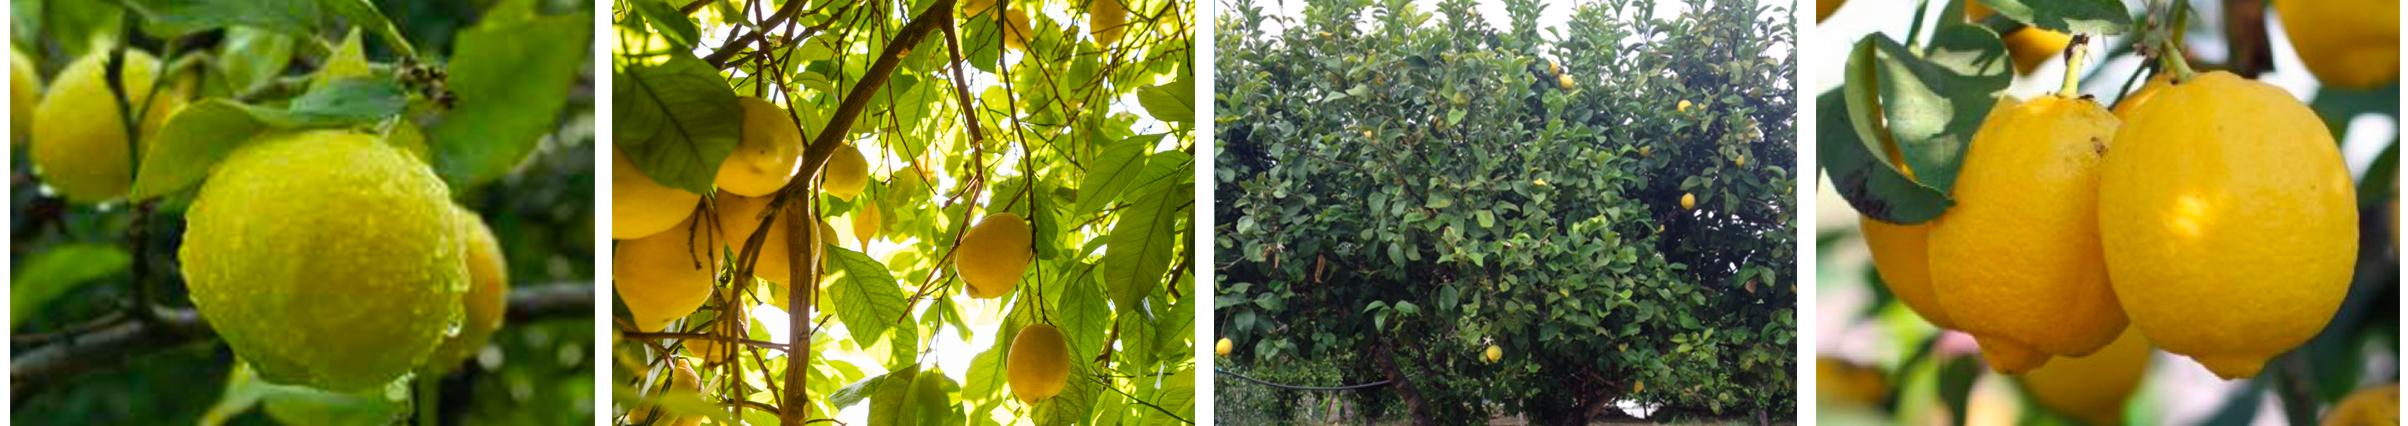 Cosmetagora formulation citron bio Sicile